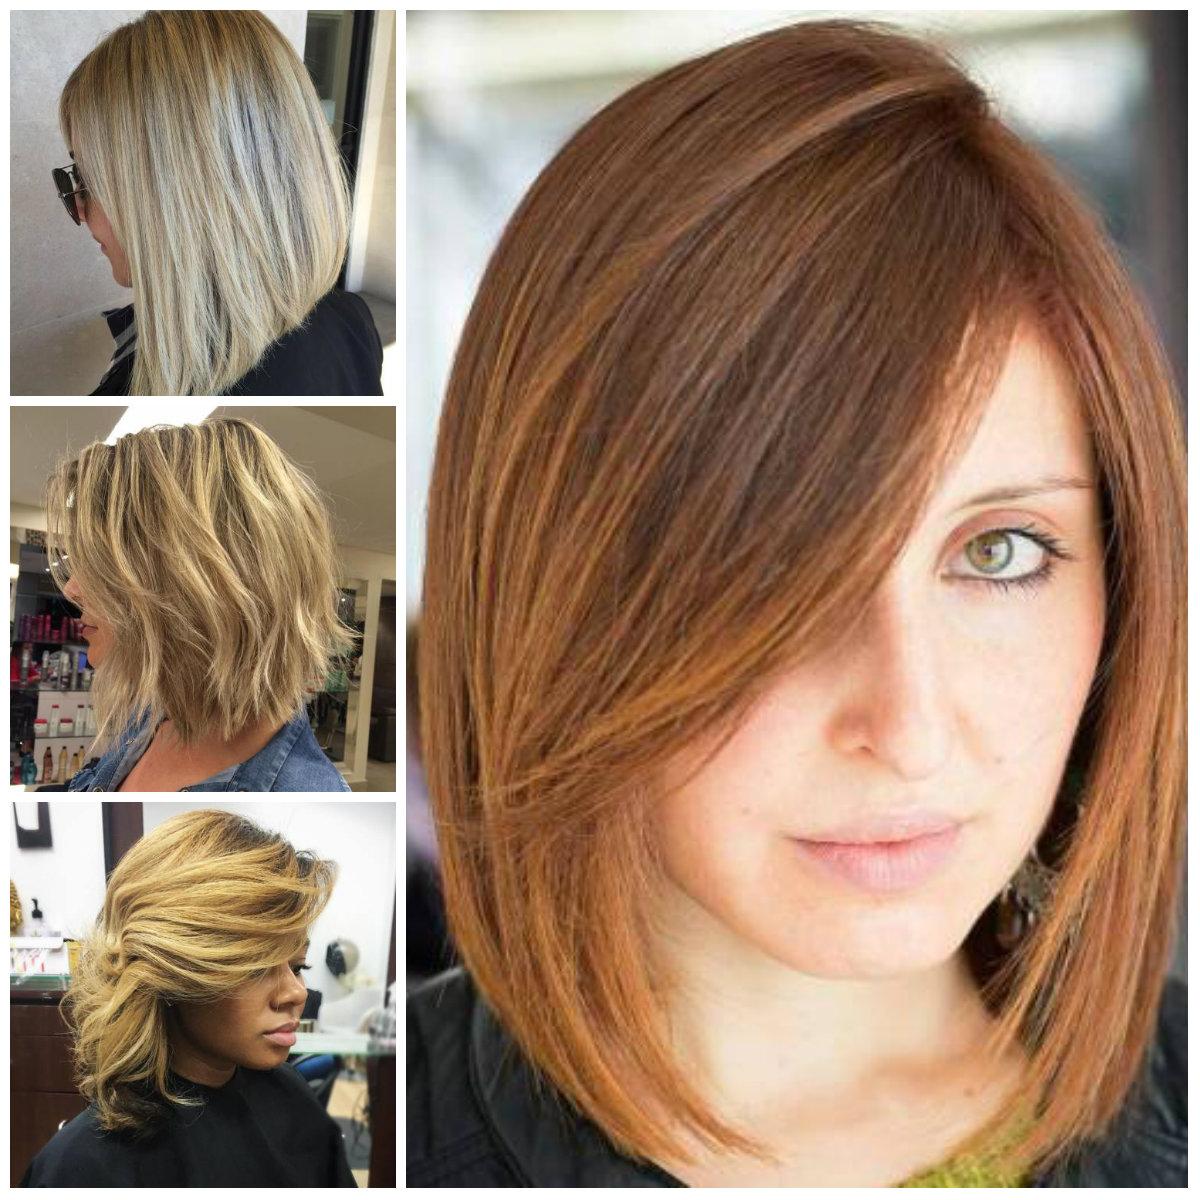 Medium Length Hair with Bangs